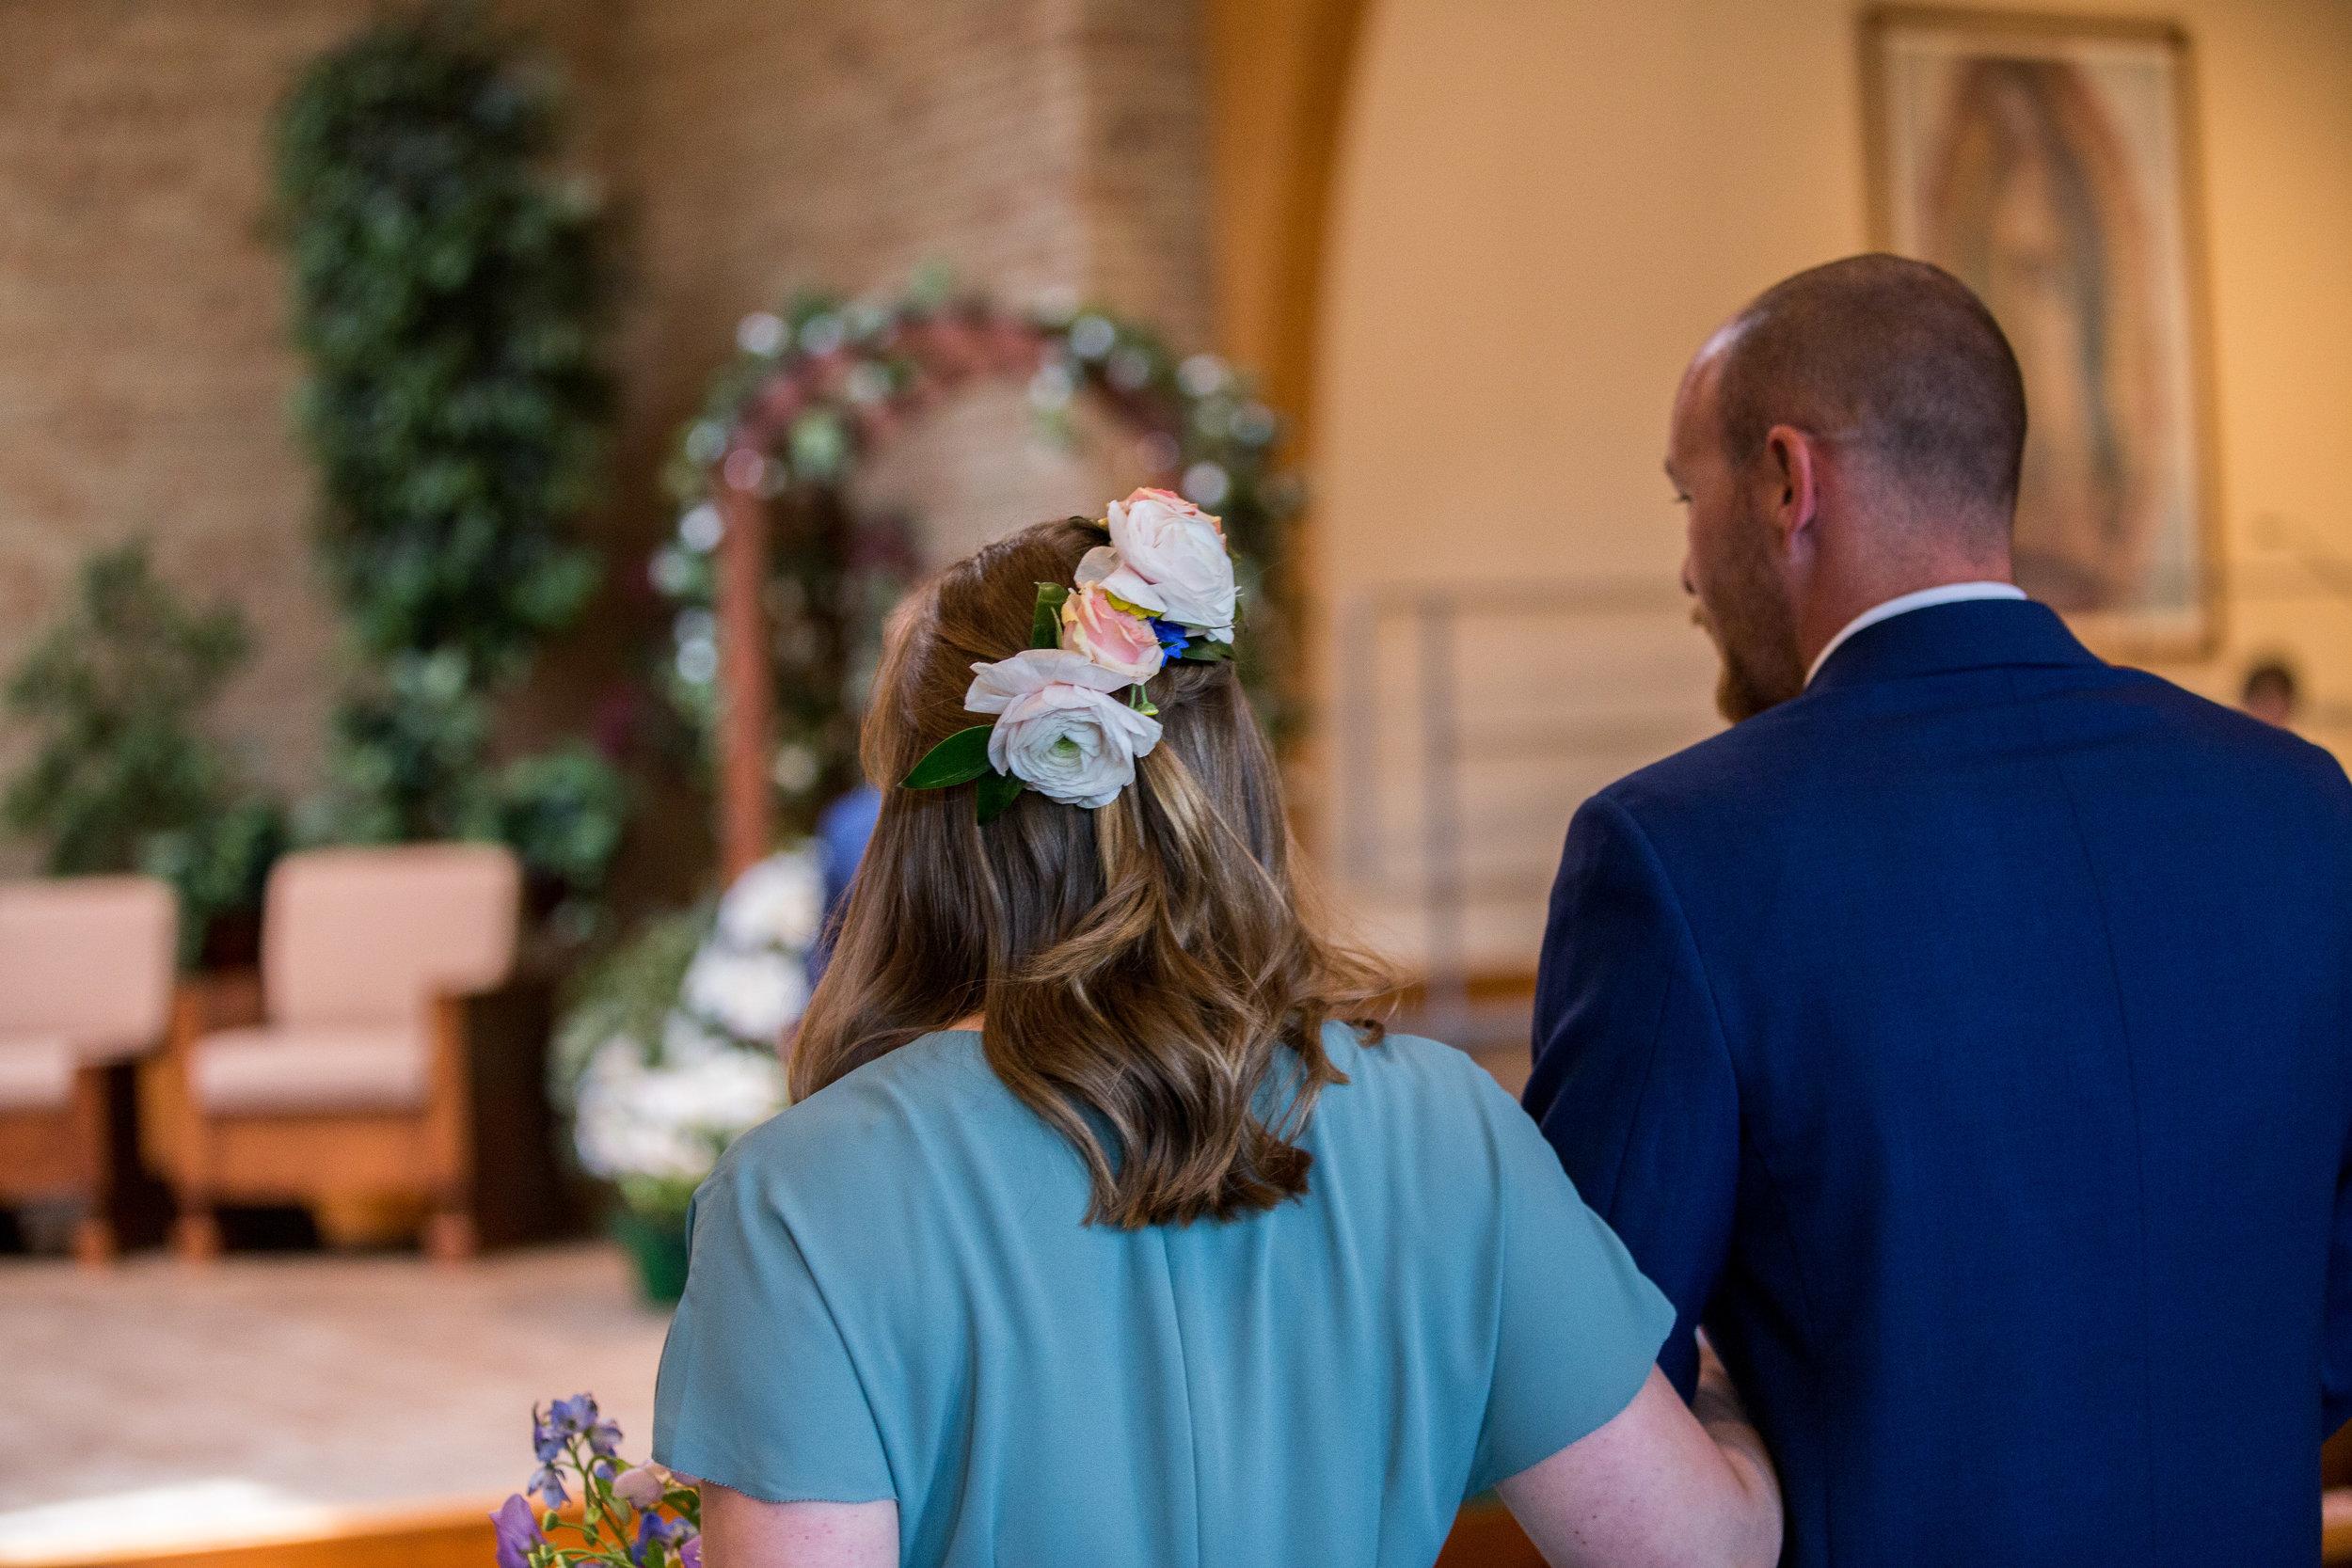 Natalie and Dallas Mooney Wedding 6-8-19_Tania Watt Photography-60.jpg